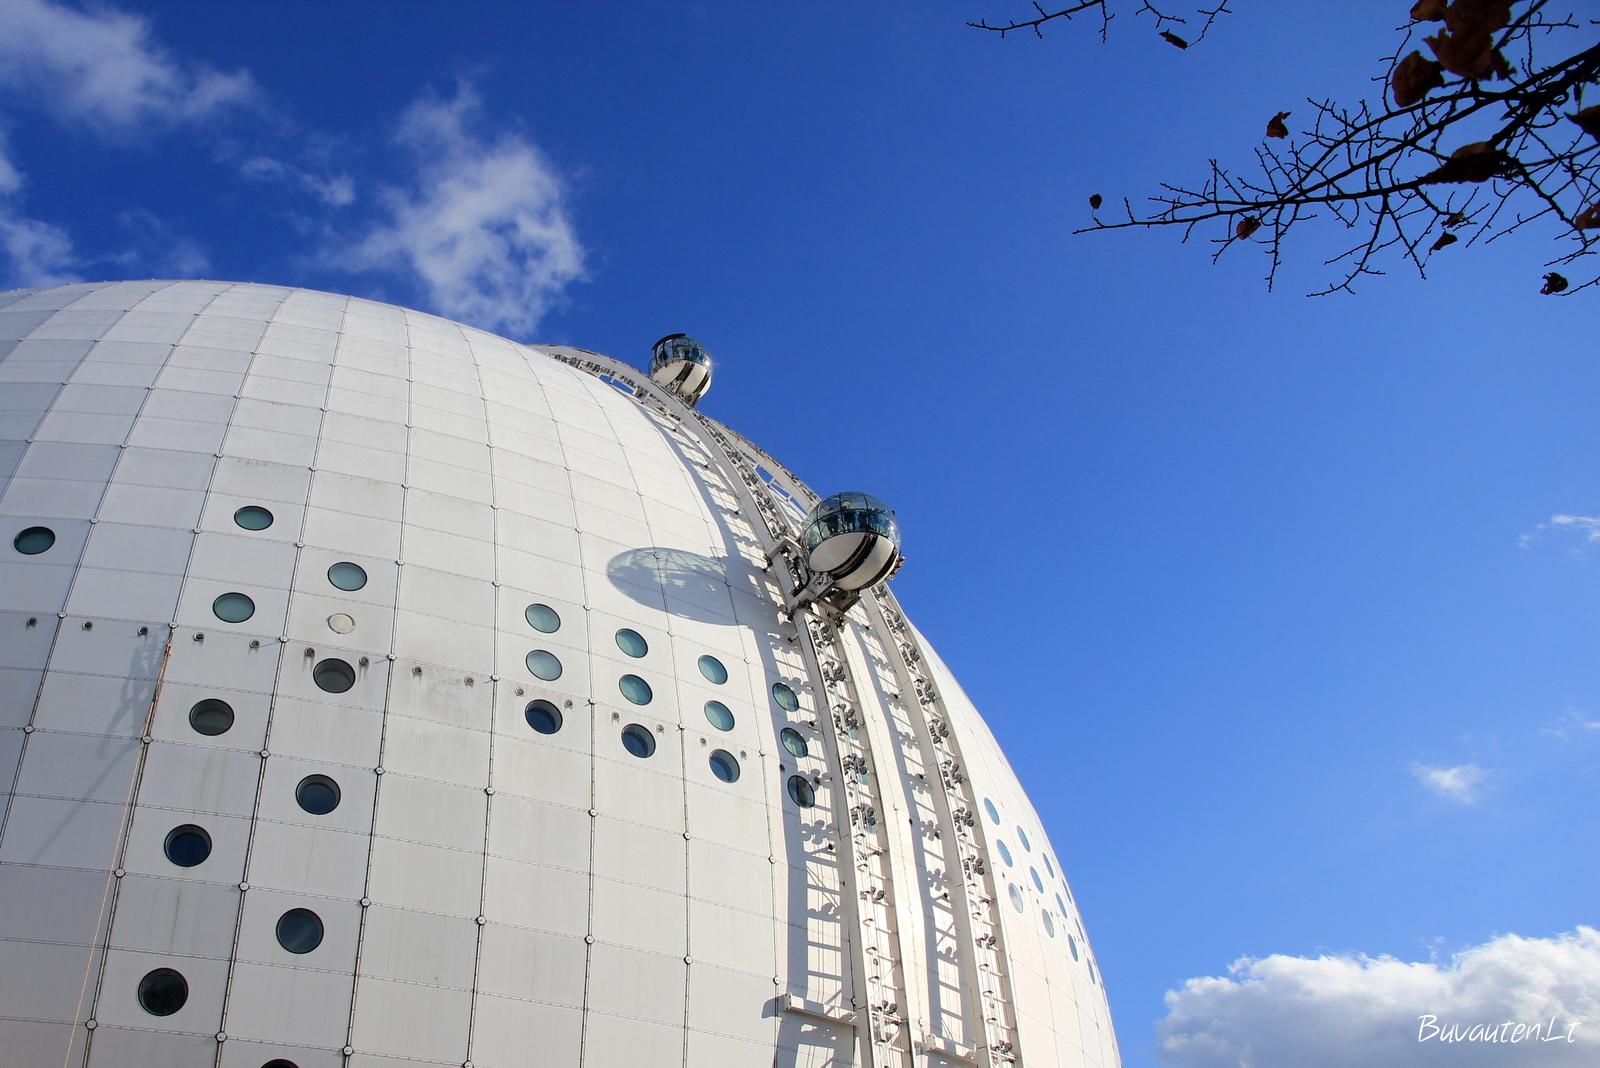 Eriksson Globe arenos Skyview keltuvai